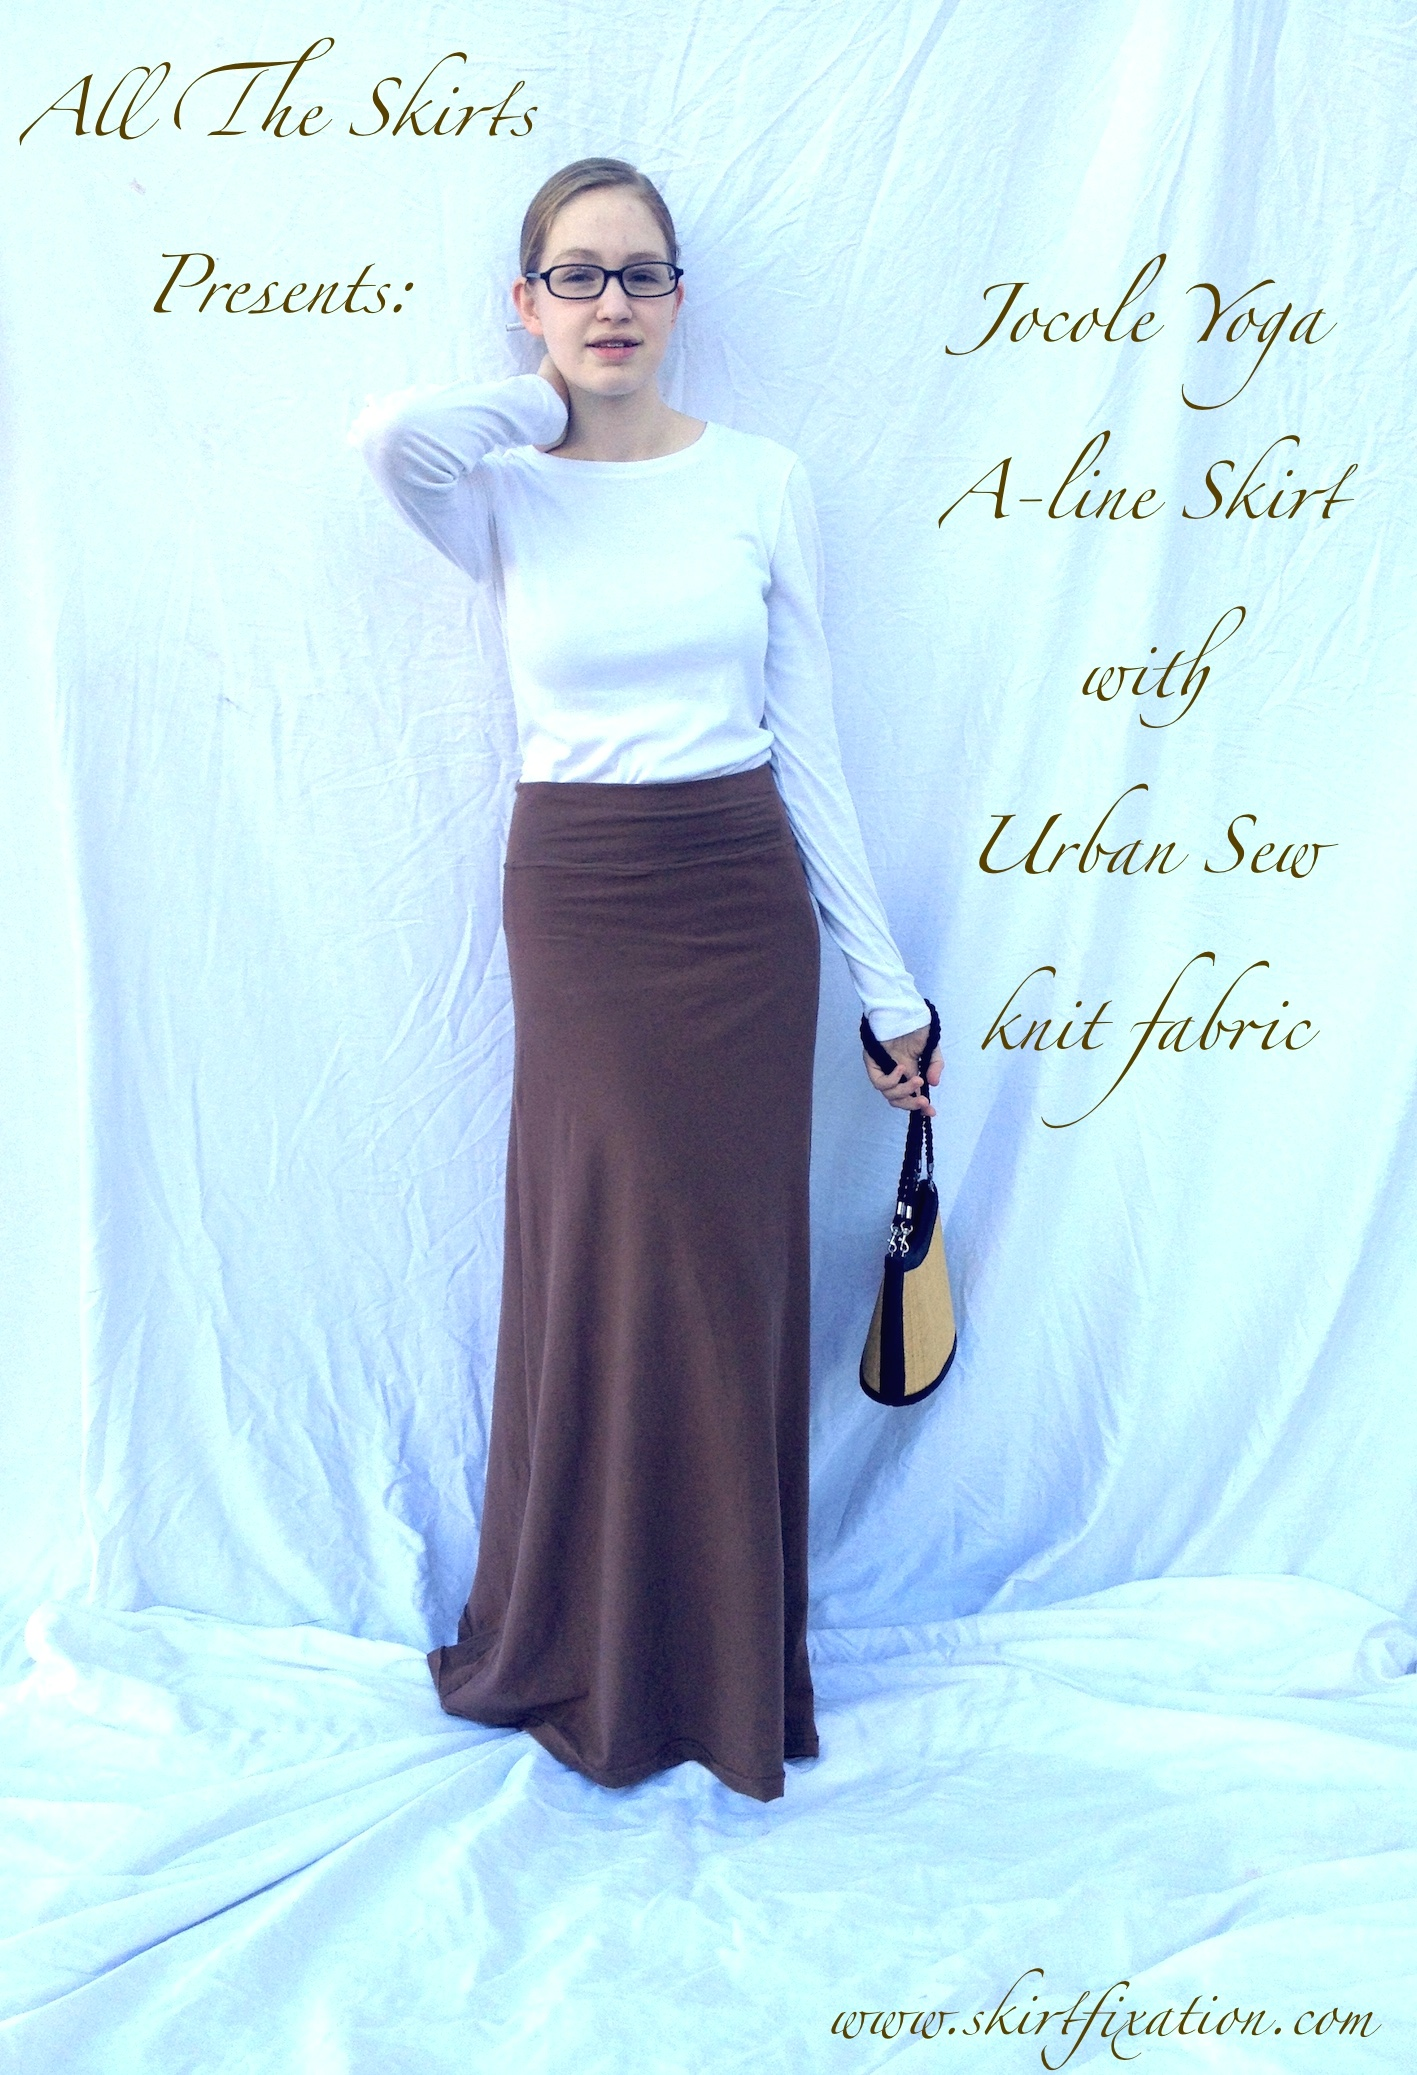 Jocole Yoga A-Line skirt sewn by Skirt Fixation using Urban Sew knit fabric